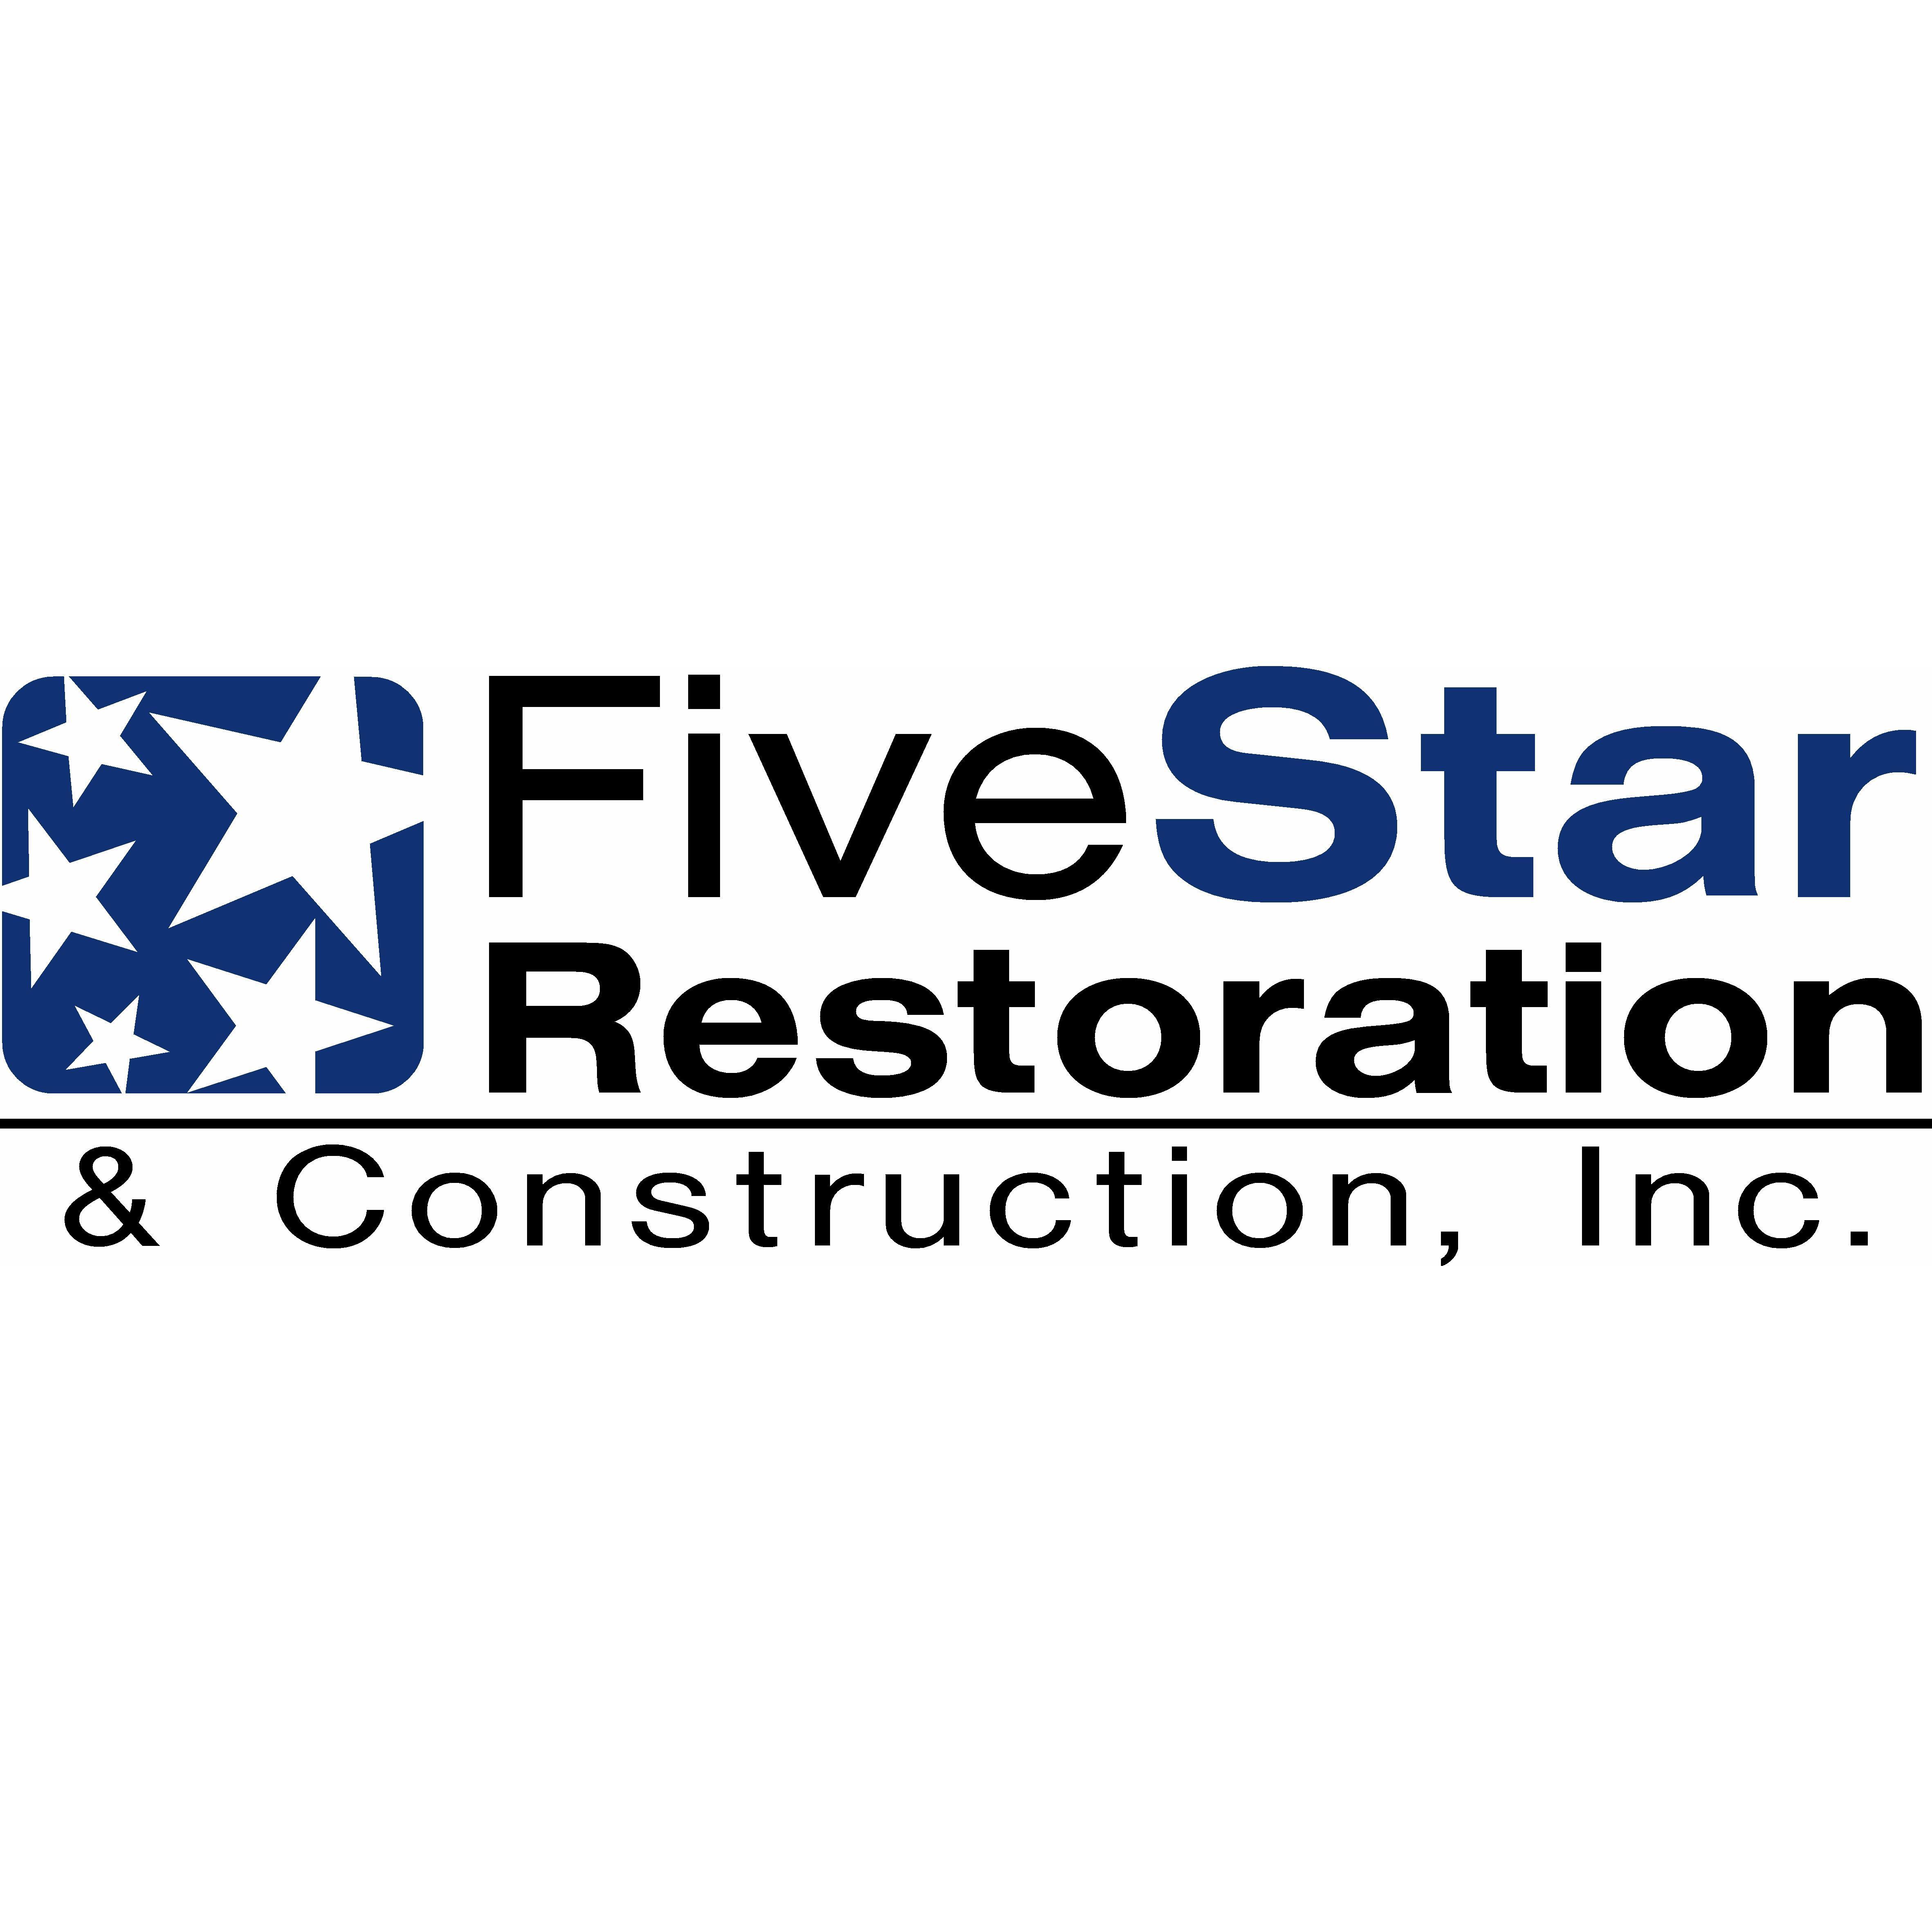 Five Star Restoration & Construction, Inc.